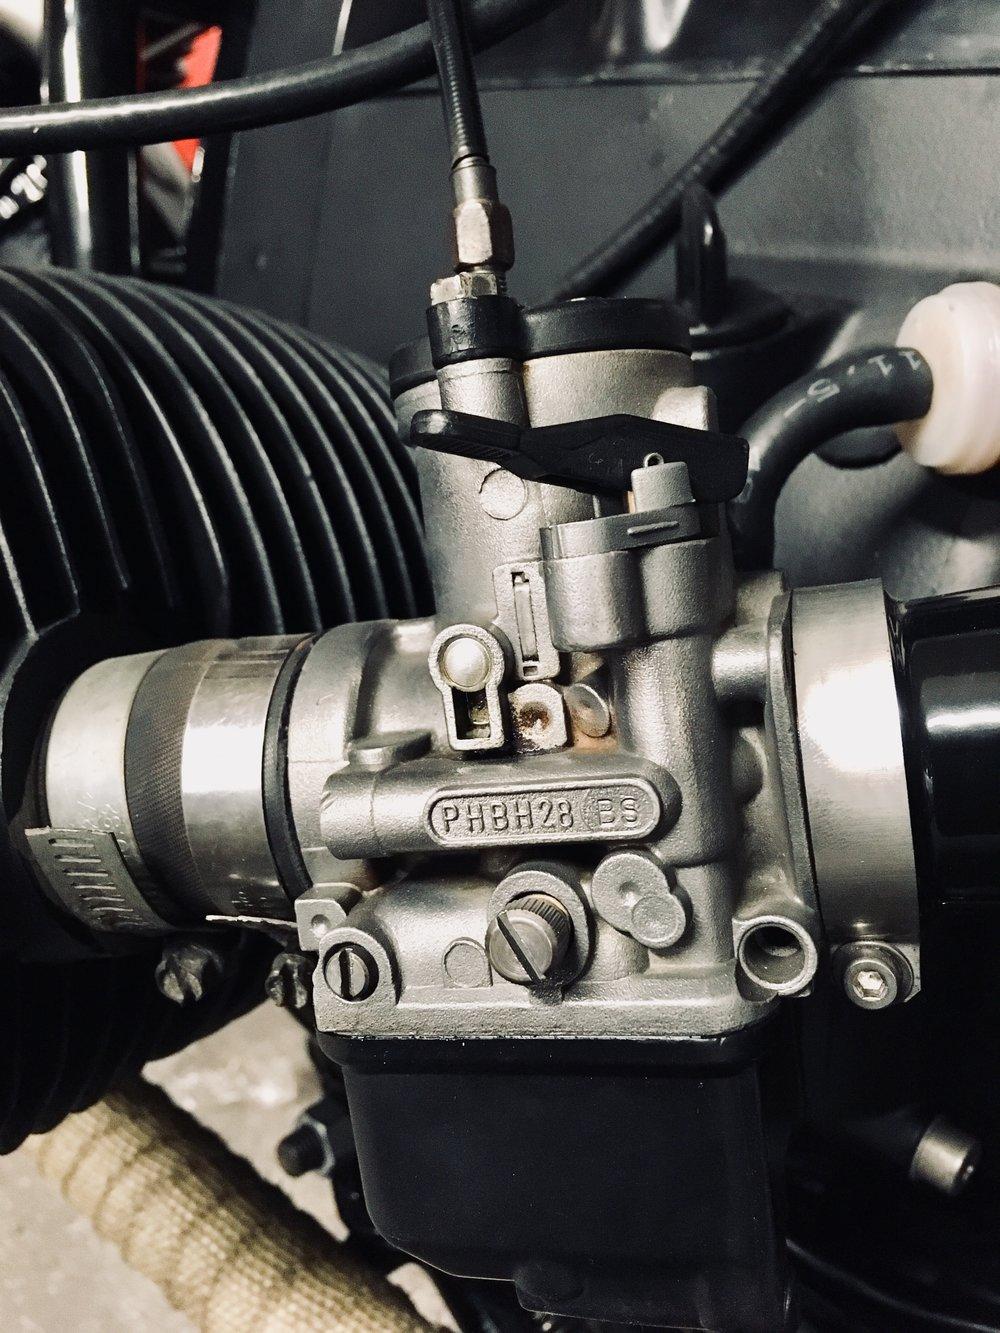 Fully reconditioned PHBH28  Dell'Orto  carburetors installed instead of the original  Bing  carburetors.